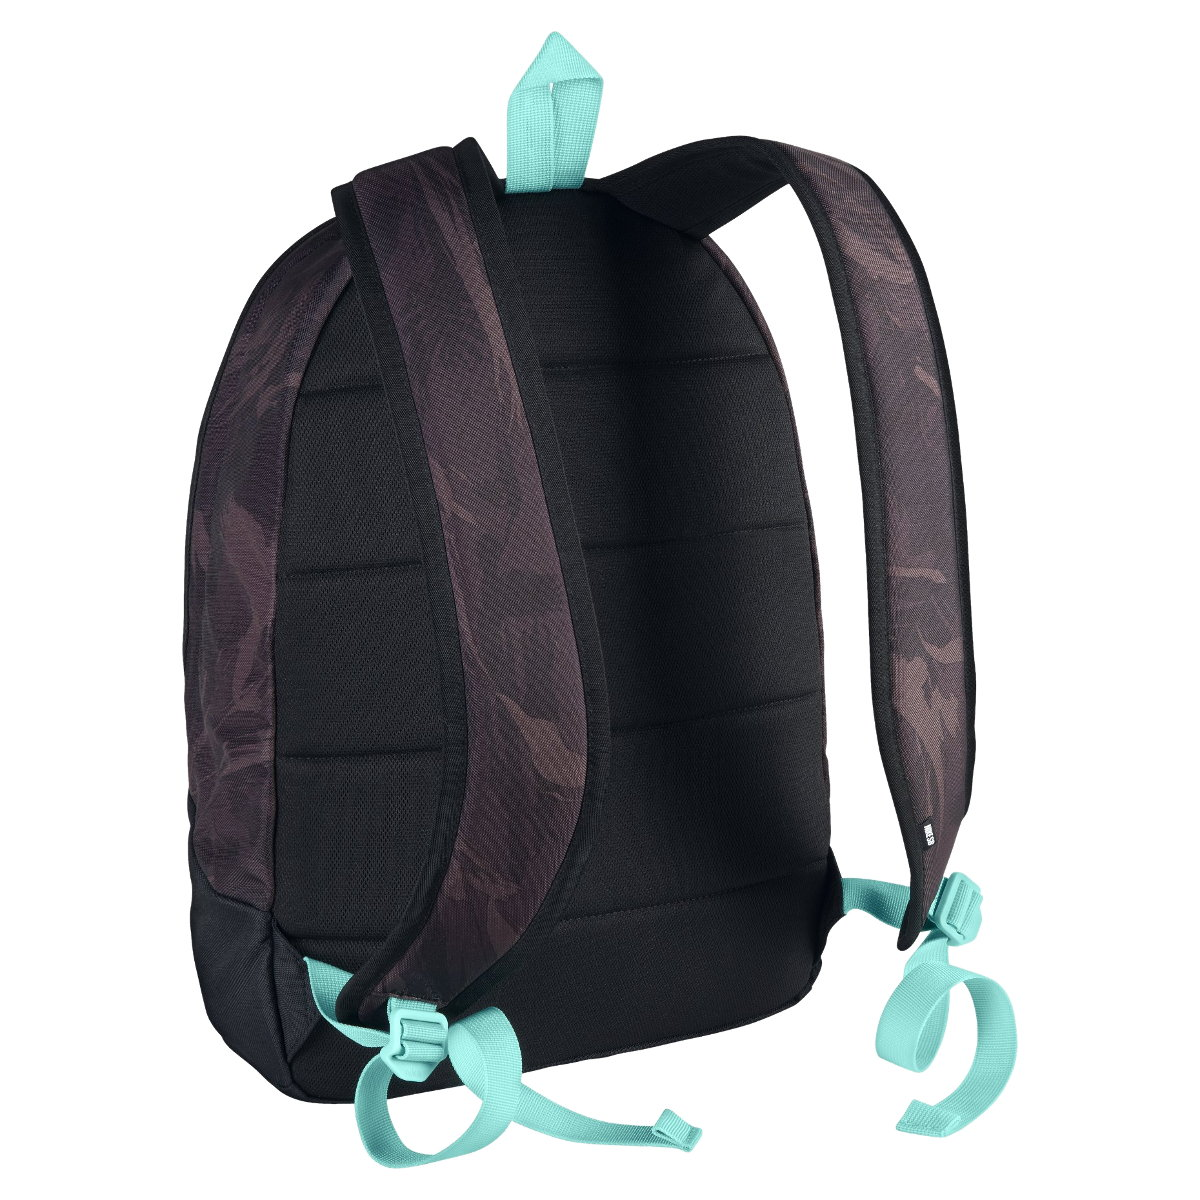 9d4a4c9268e1d Plecak NIKE SB Piedmont (black black mint) - Sklep PRLBMX